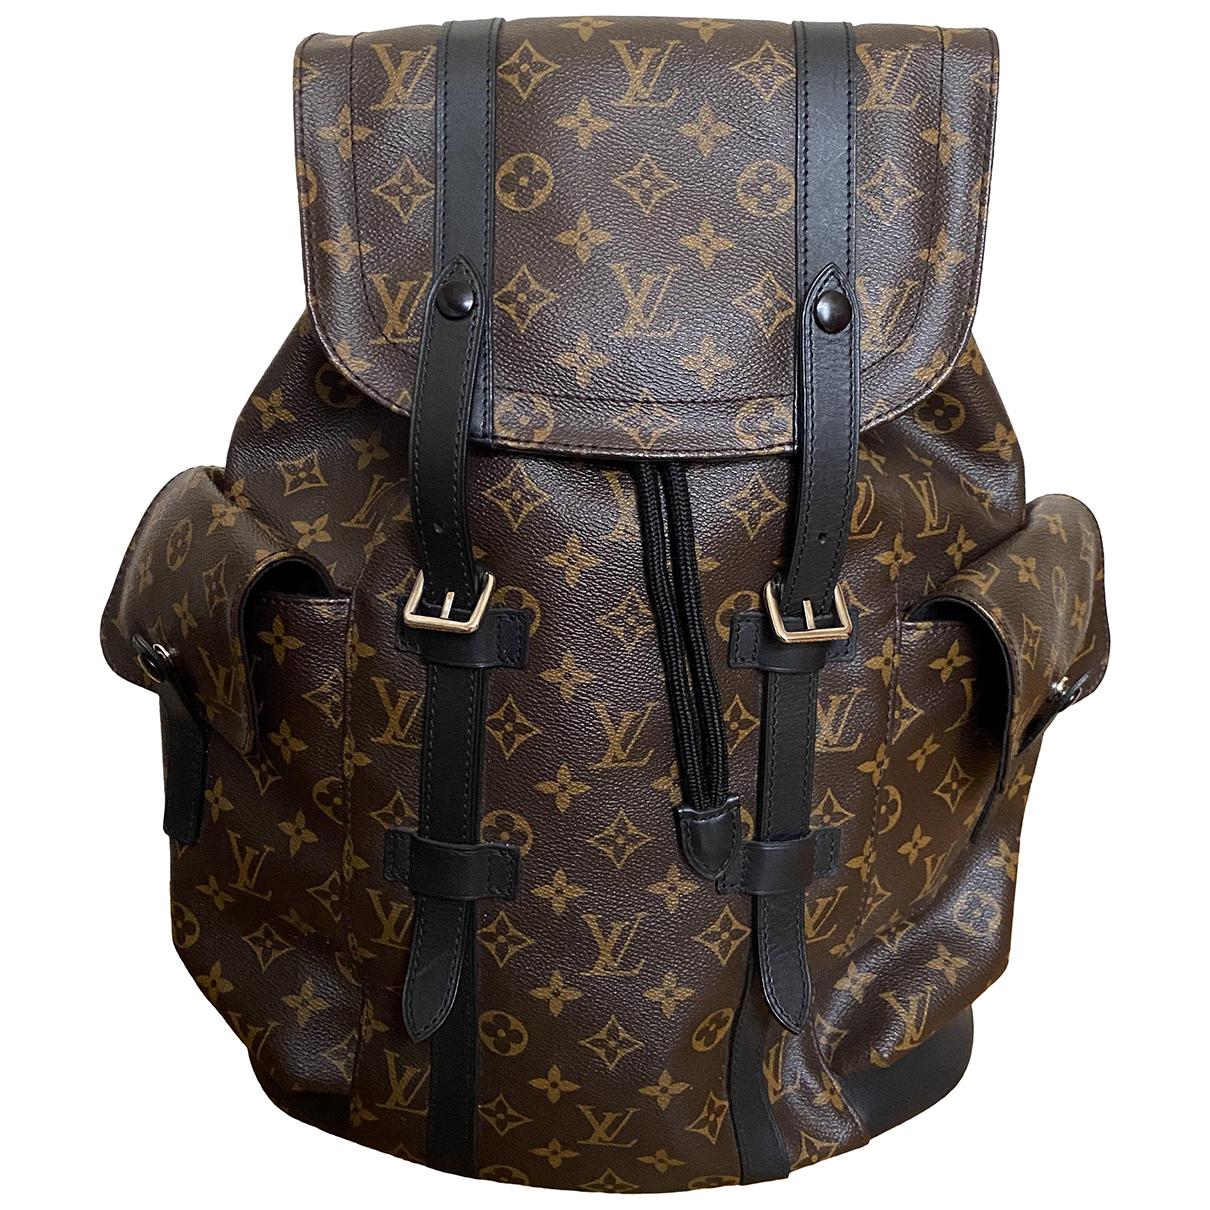 Louis Vuitton Christopher Backpack Cloth bag for Men N